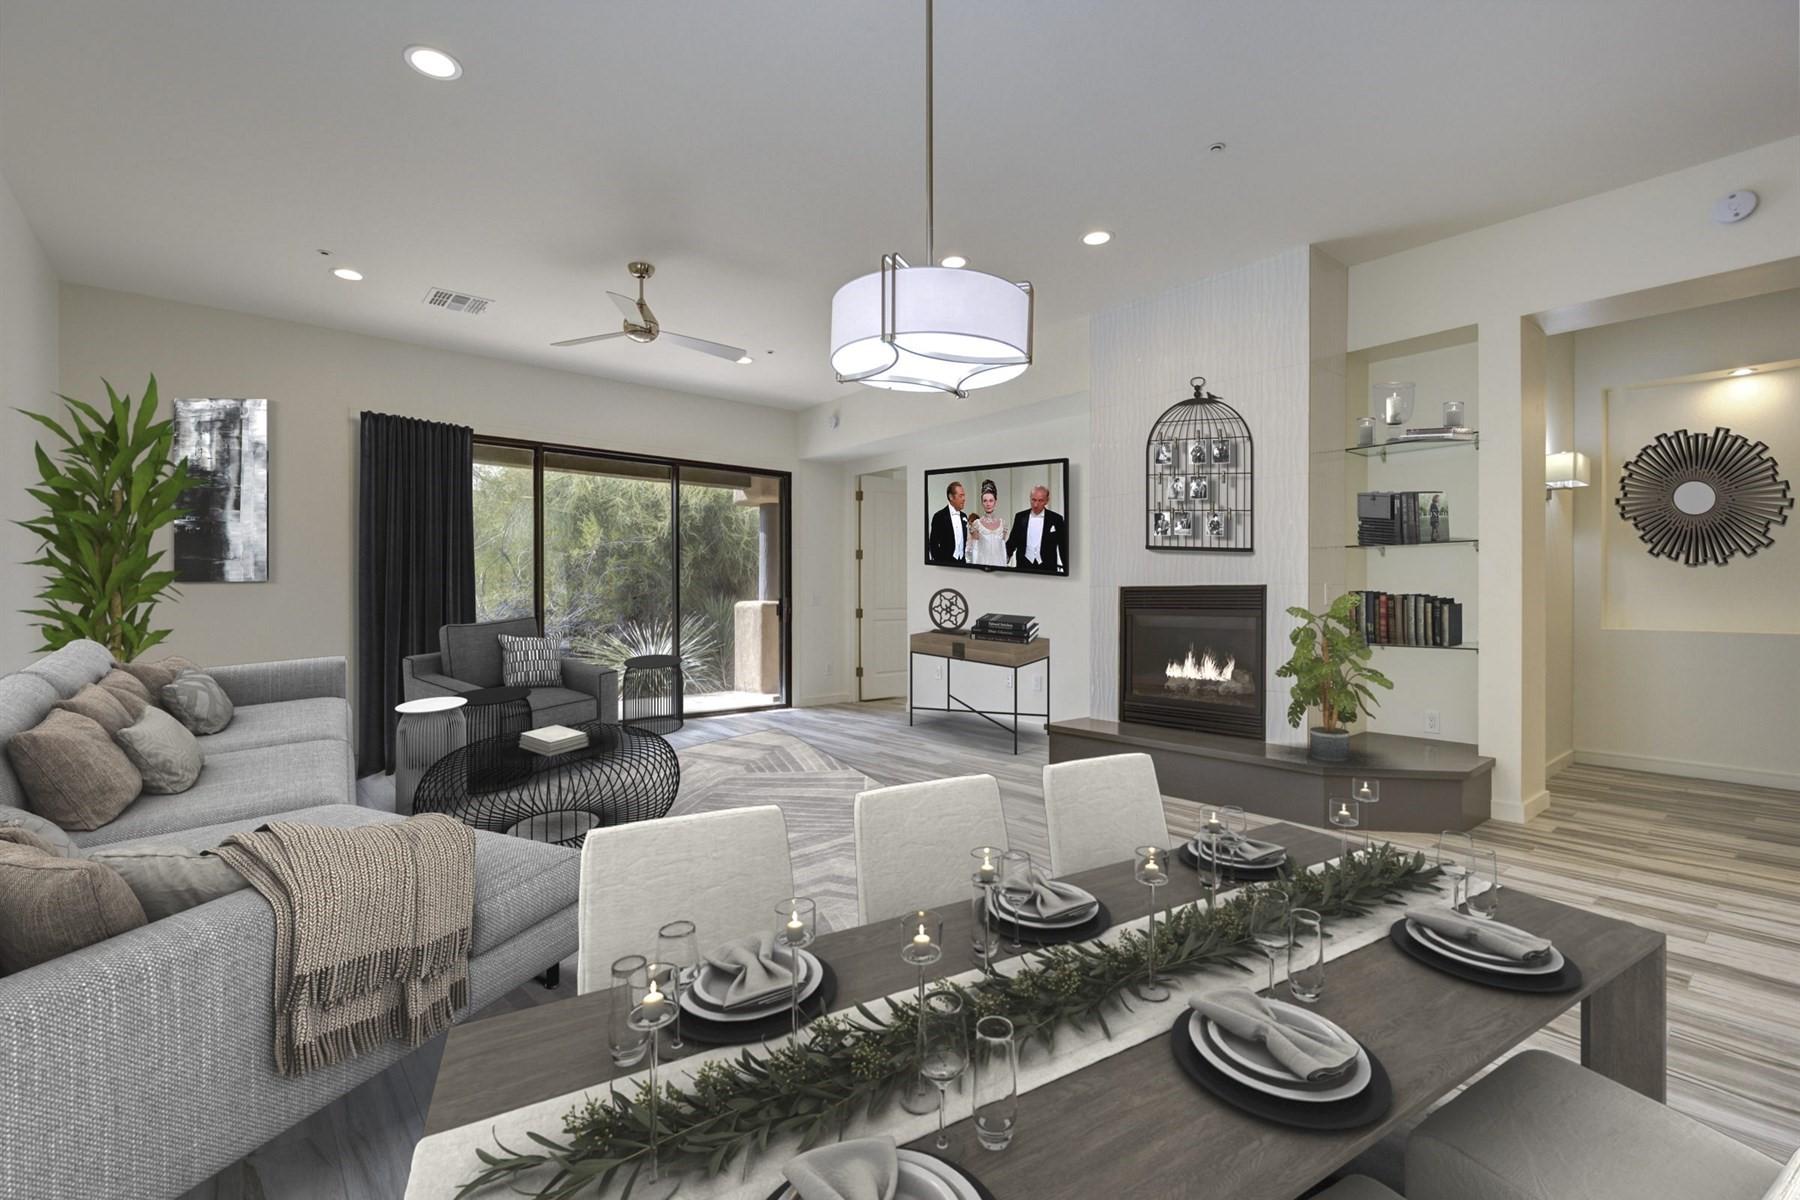 Таунхаус для того Продажа на Lovely Townhome in Troon North 28440 N 101st Way, Scottsdale, Аризона, 85262 Соединенные Штаты